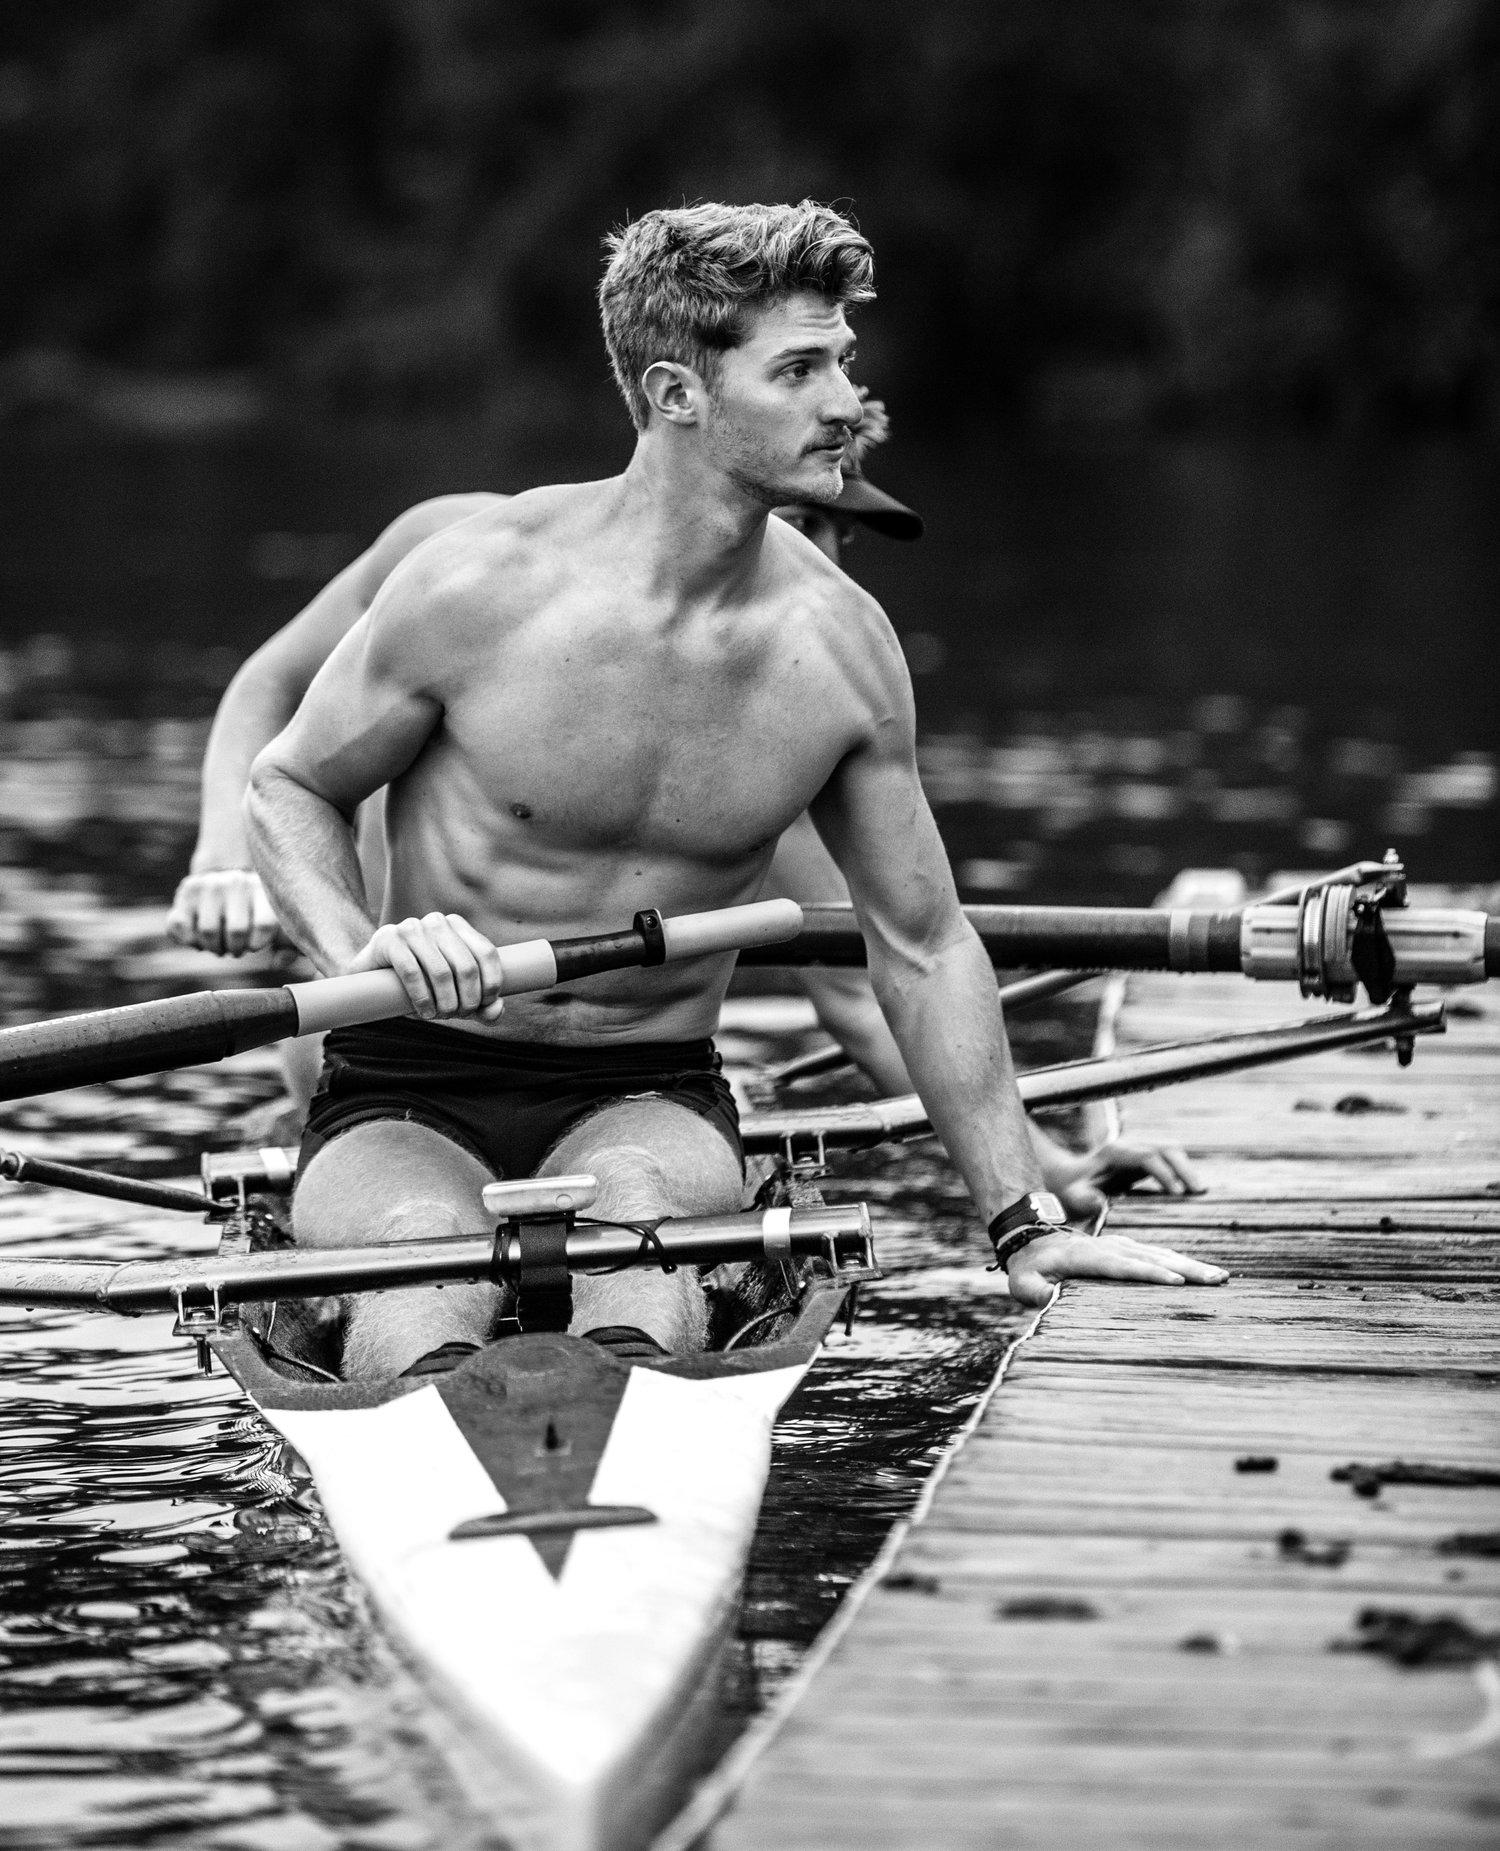 Michigan Men's Rowing